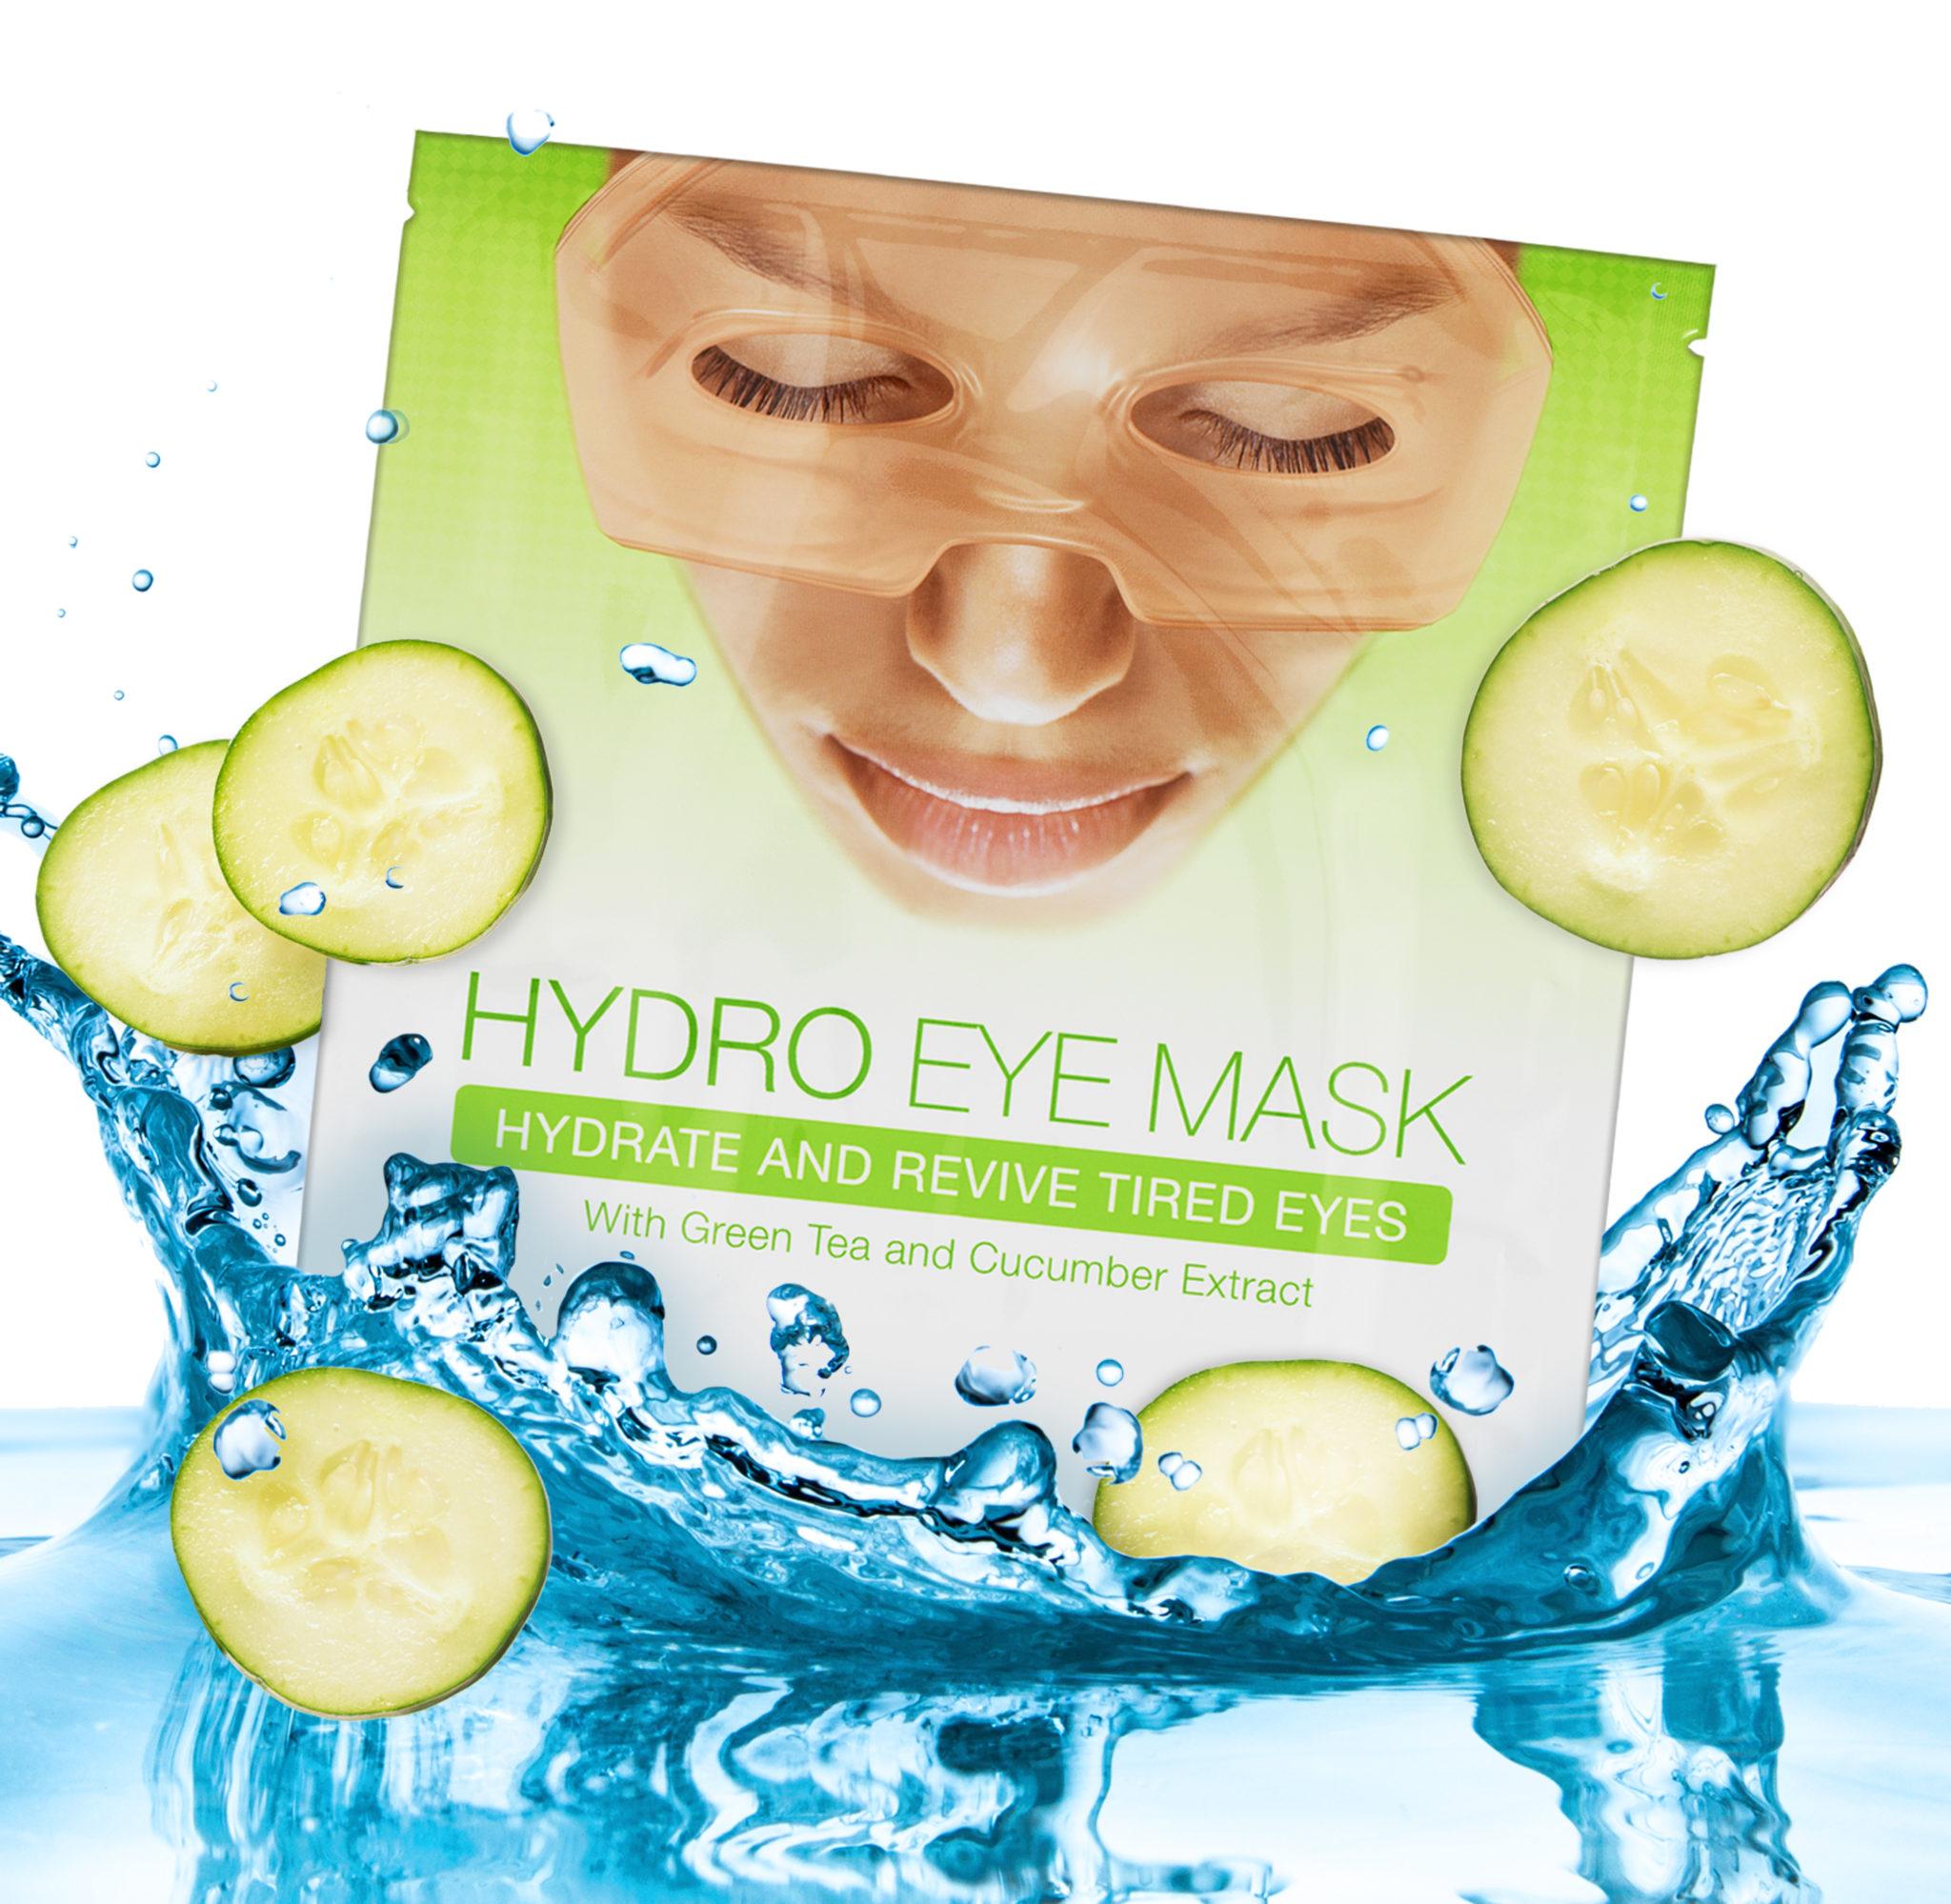 CACI Hydro Eye Mask Cucumber